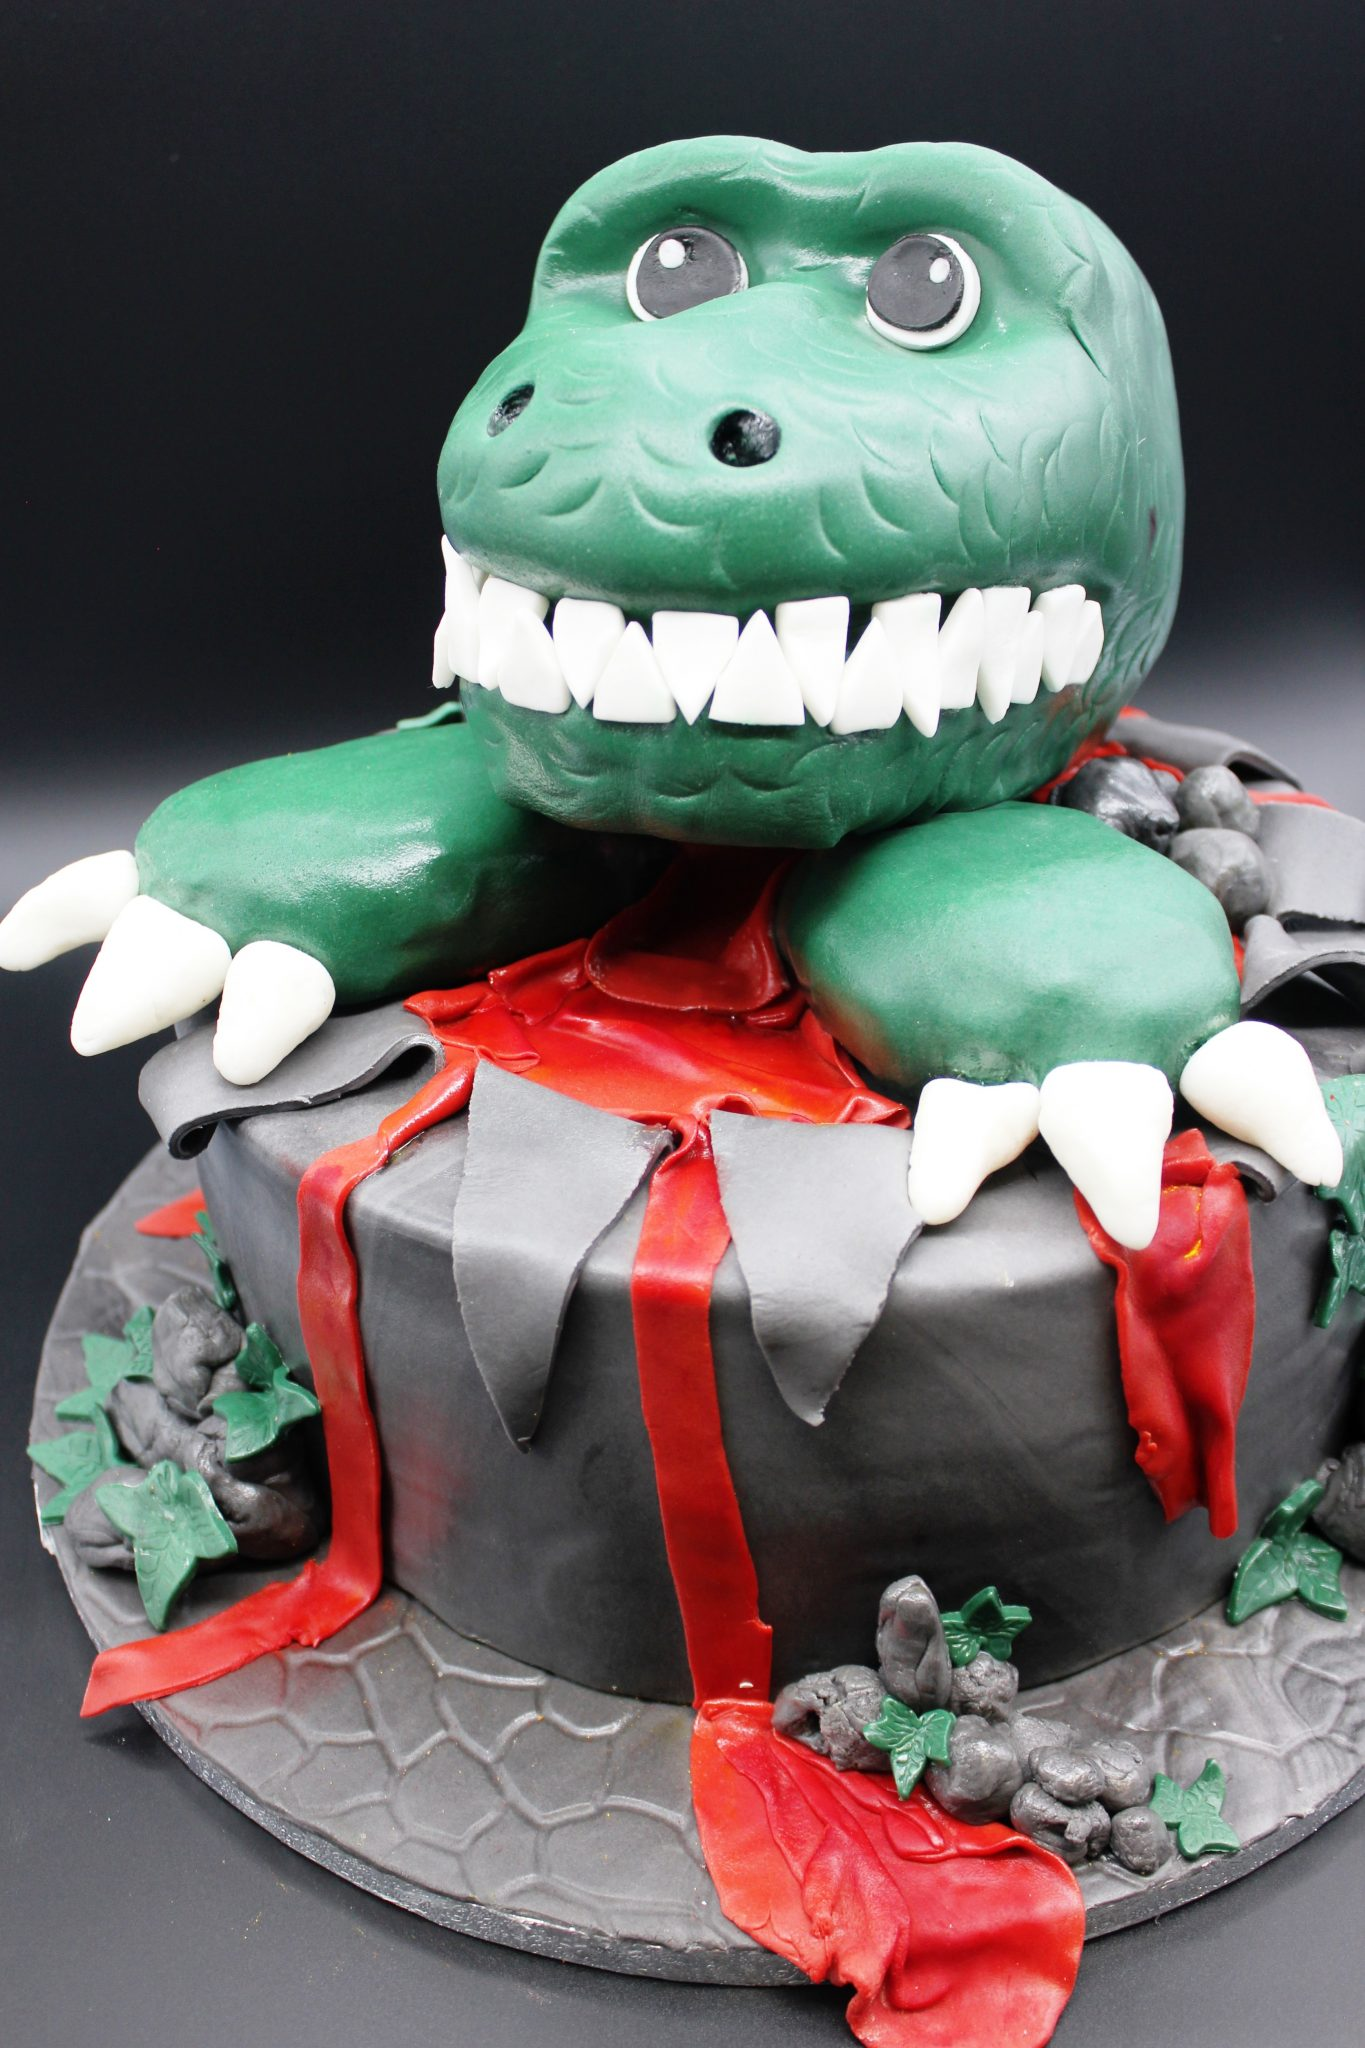 Dino-Party, Dino Motivtorte, Dino Mottoparty